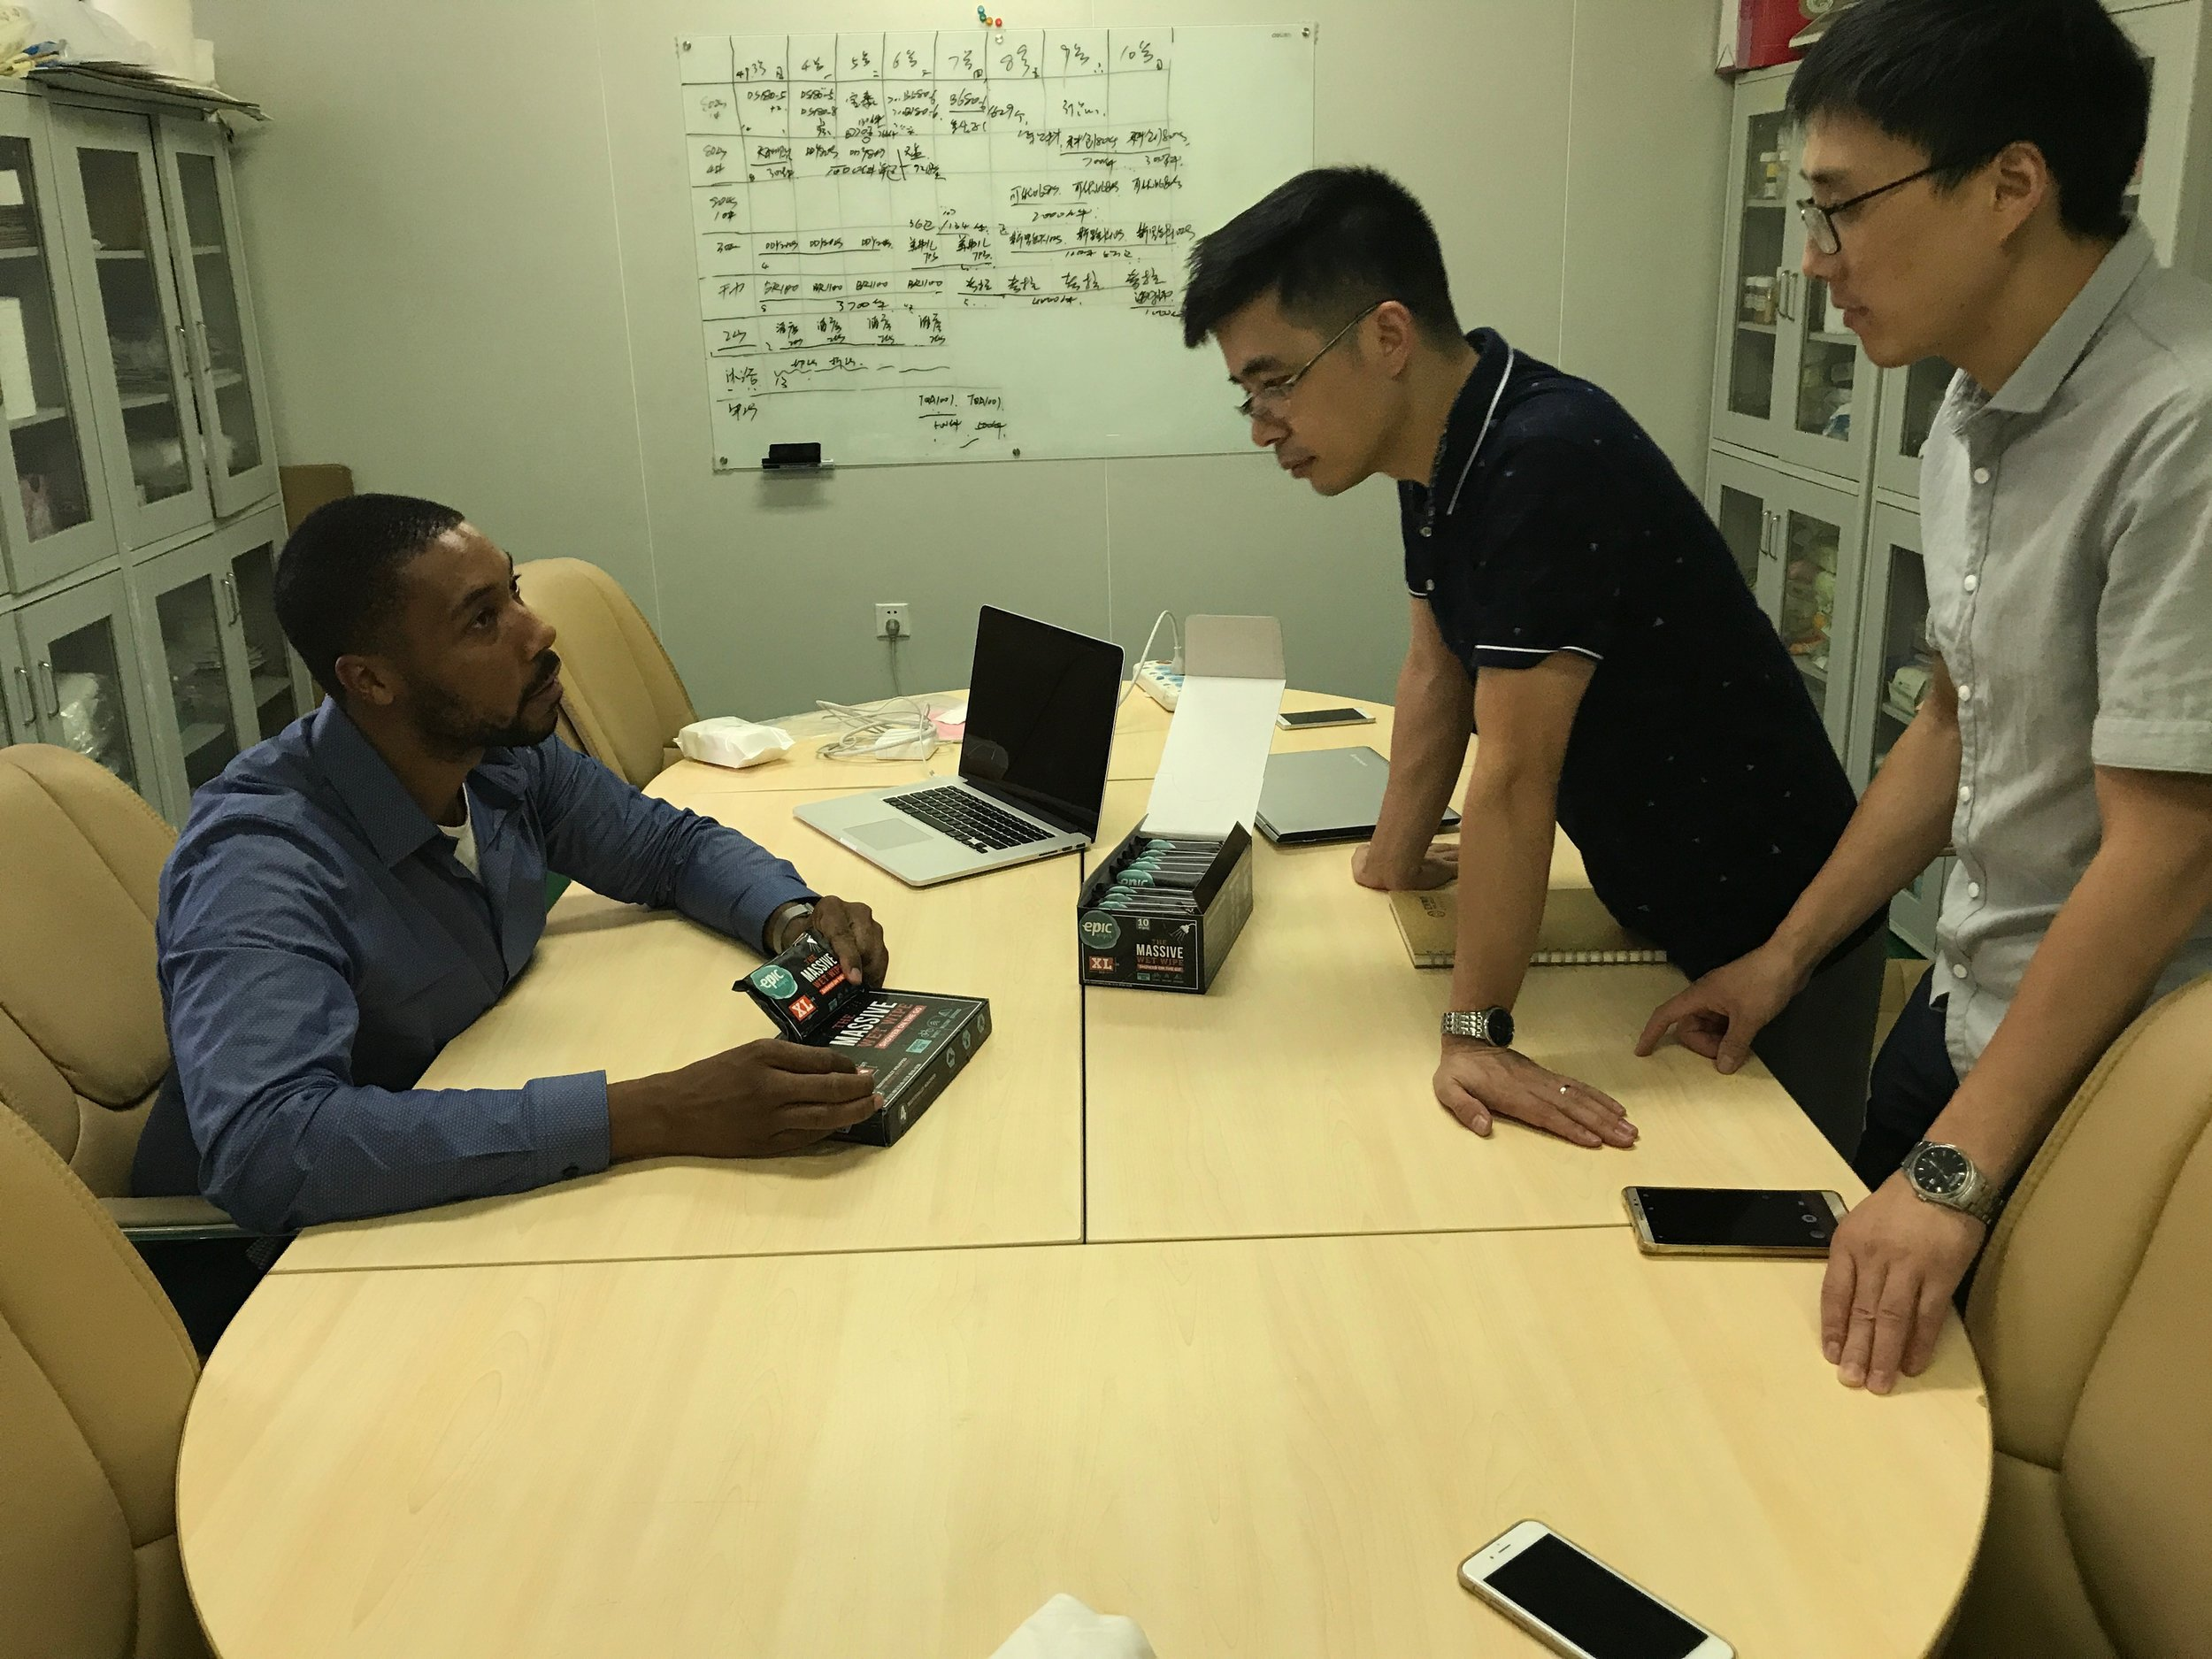 Get the job done - Fuzhou, 2017